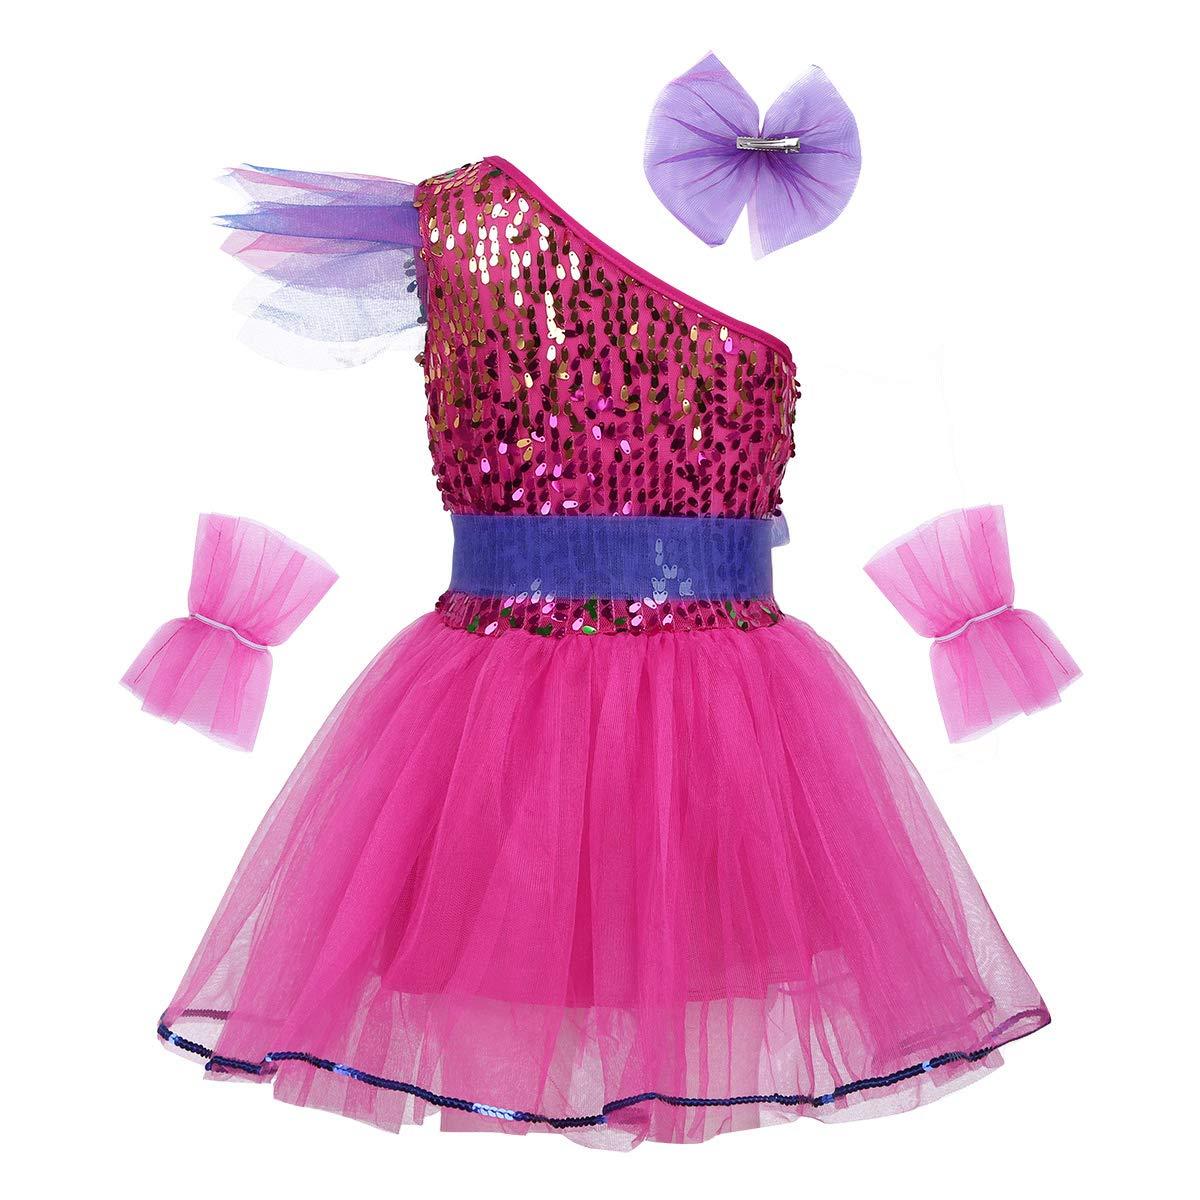 Agoky Kids Girls One Shoulder Sequins Ballet Dance Dress Performance Outfit for Modern Contemporary Jazz Dancewear Costume